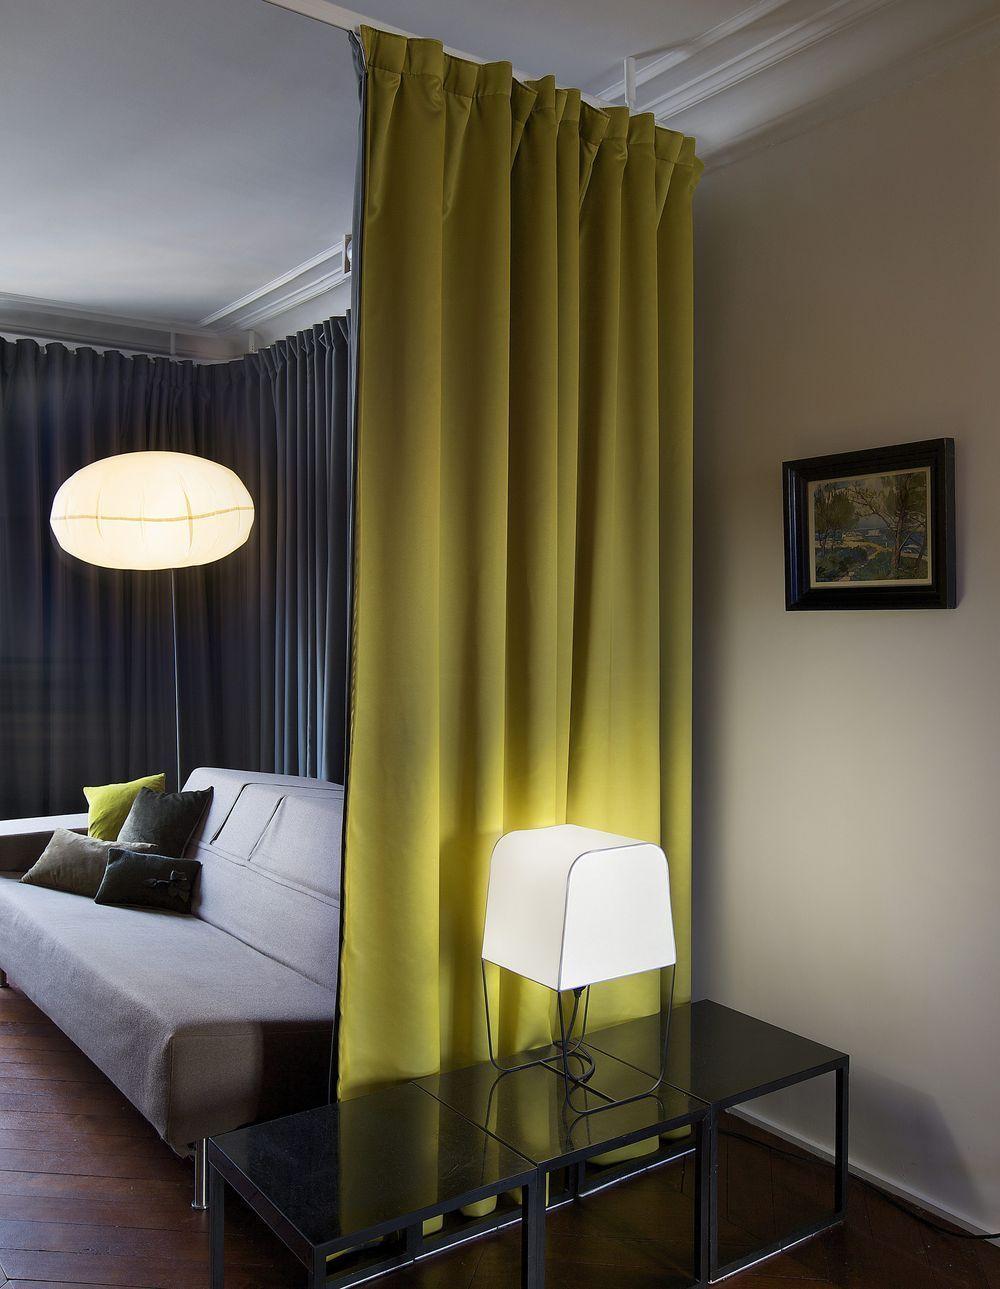 Un rideau pour organiser luespace roomdividercurtain room divider